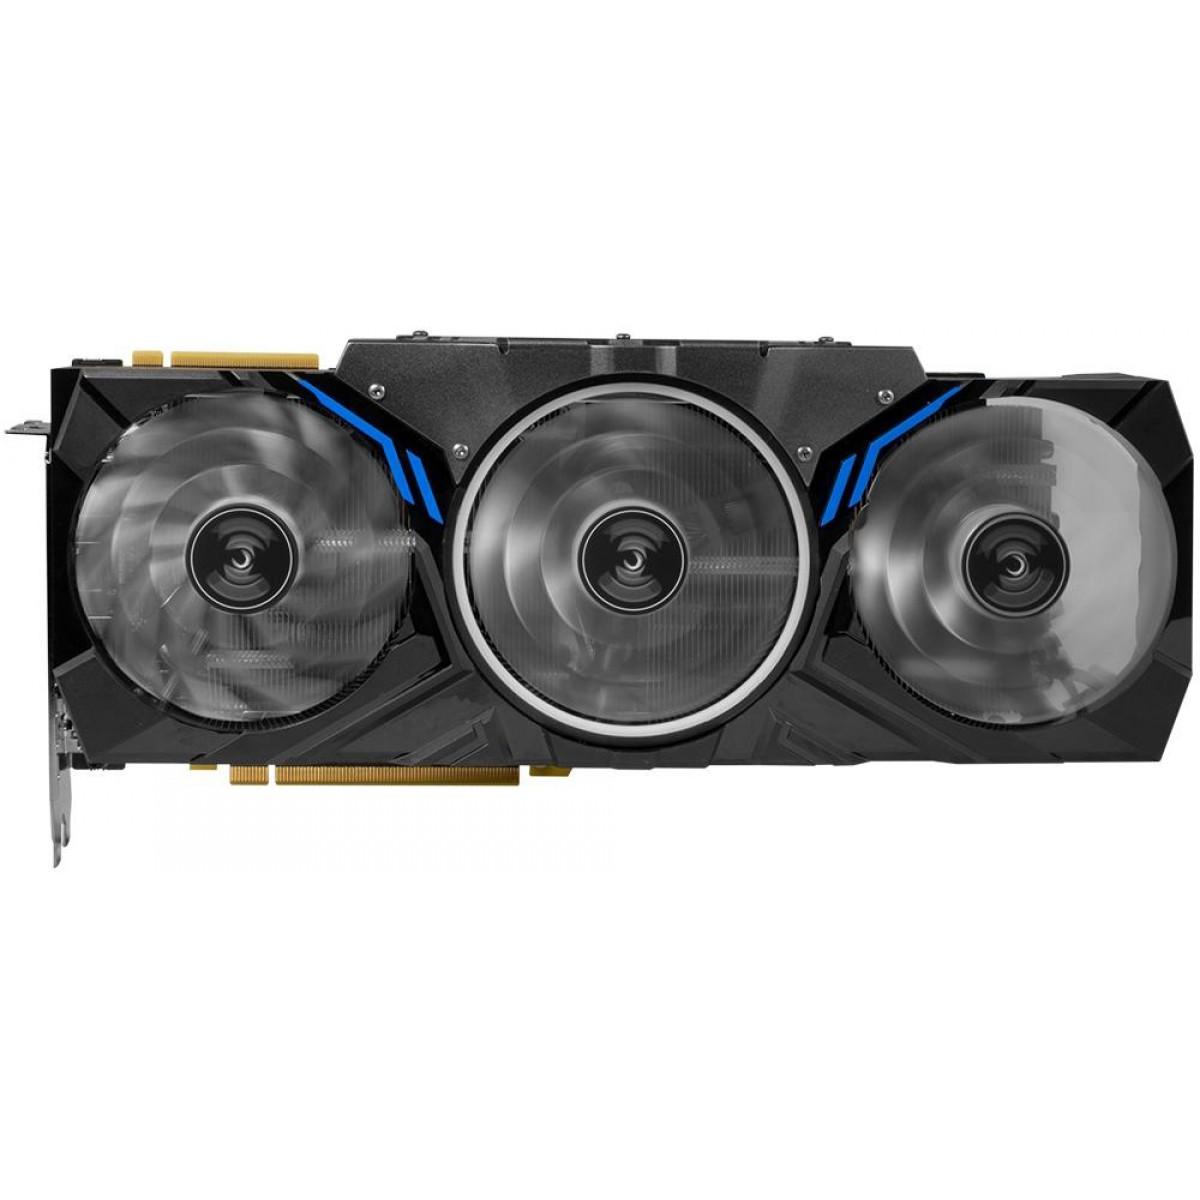 Placa de Vídeo Galax GeForce RTX 2080 Super Work The Frames Edition (1-Click OC), 8GB GDDR6, 256Bit, 28ISL6MD49ES